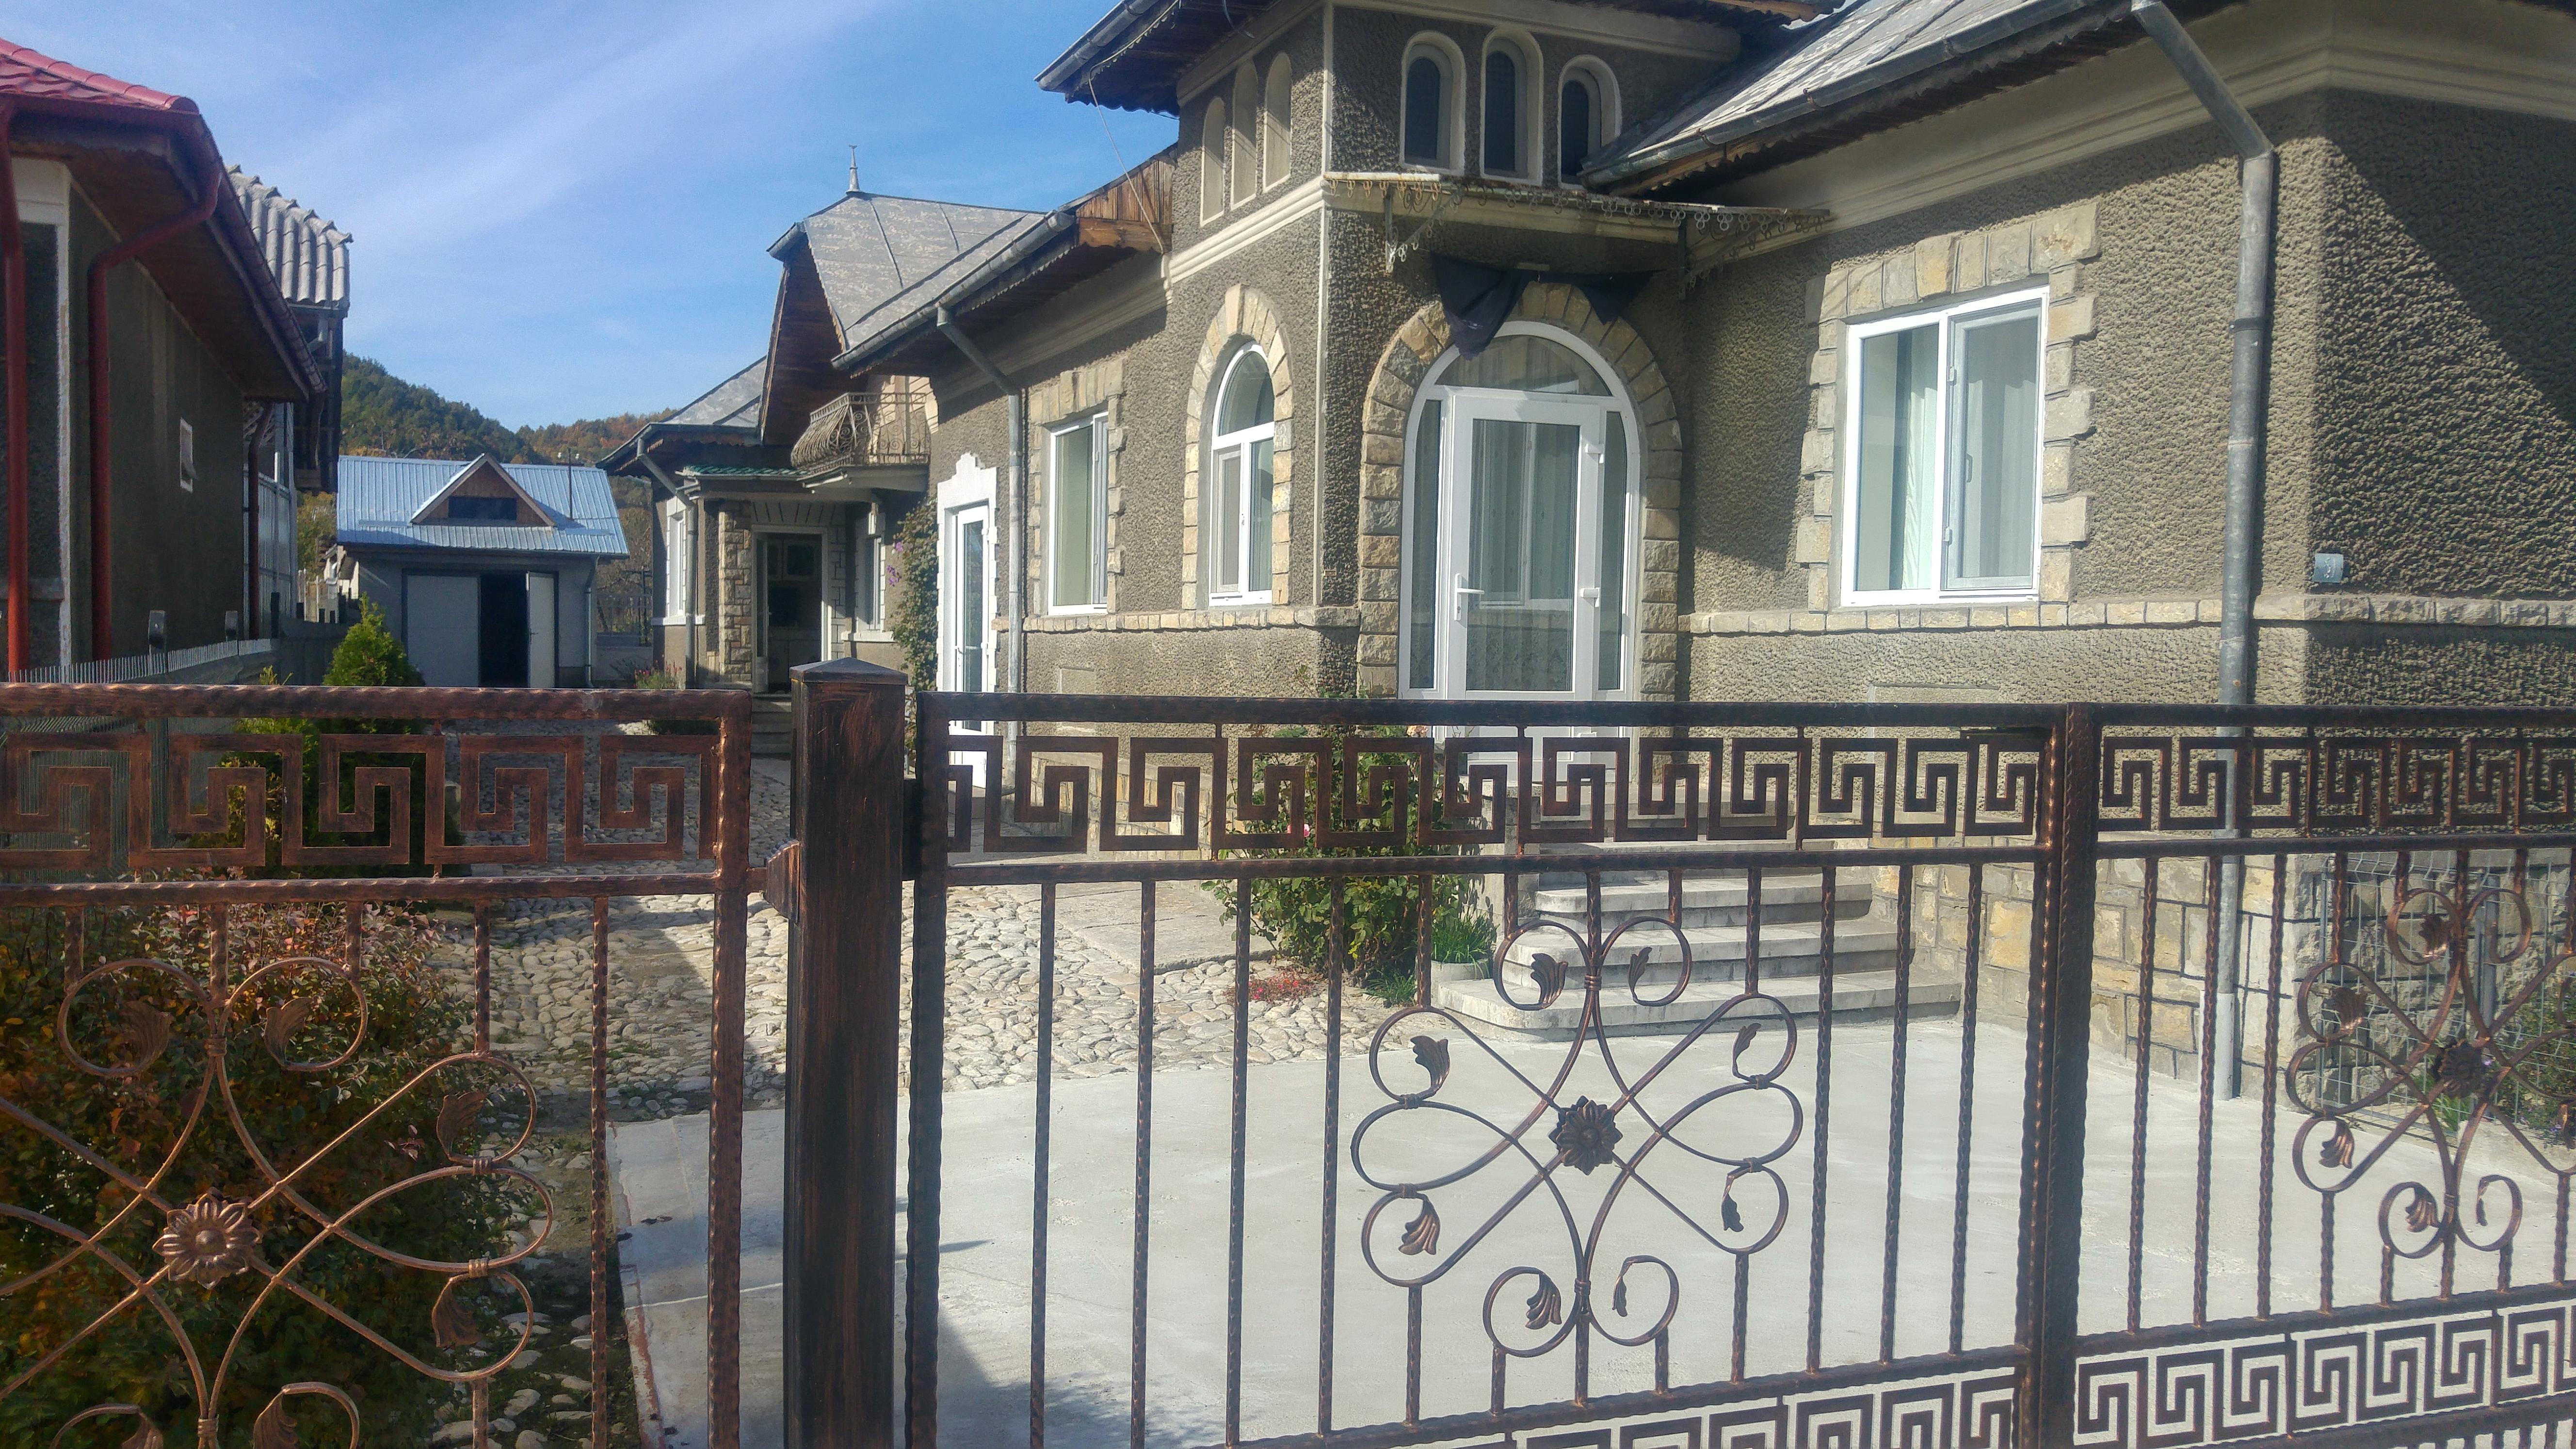 Vendita casa indipendente motaieni d mbovi a romania - Agenzie immobiliari bucarest ...